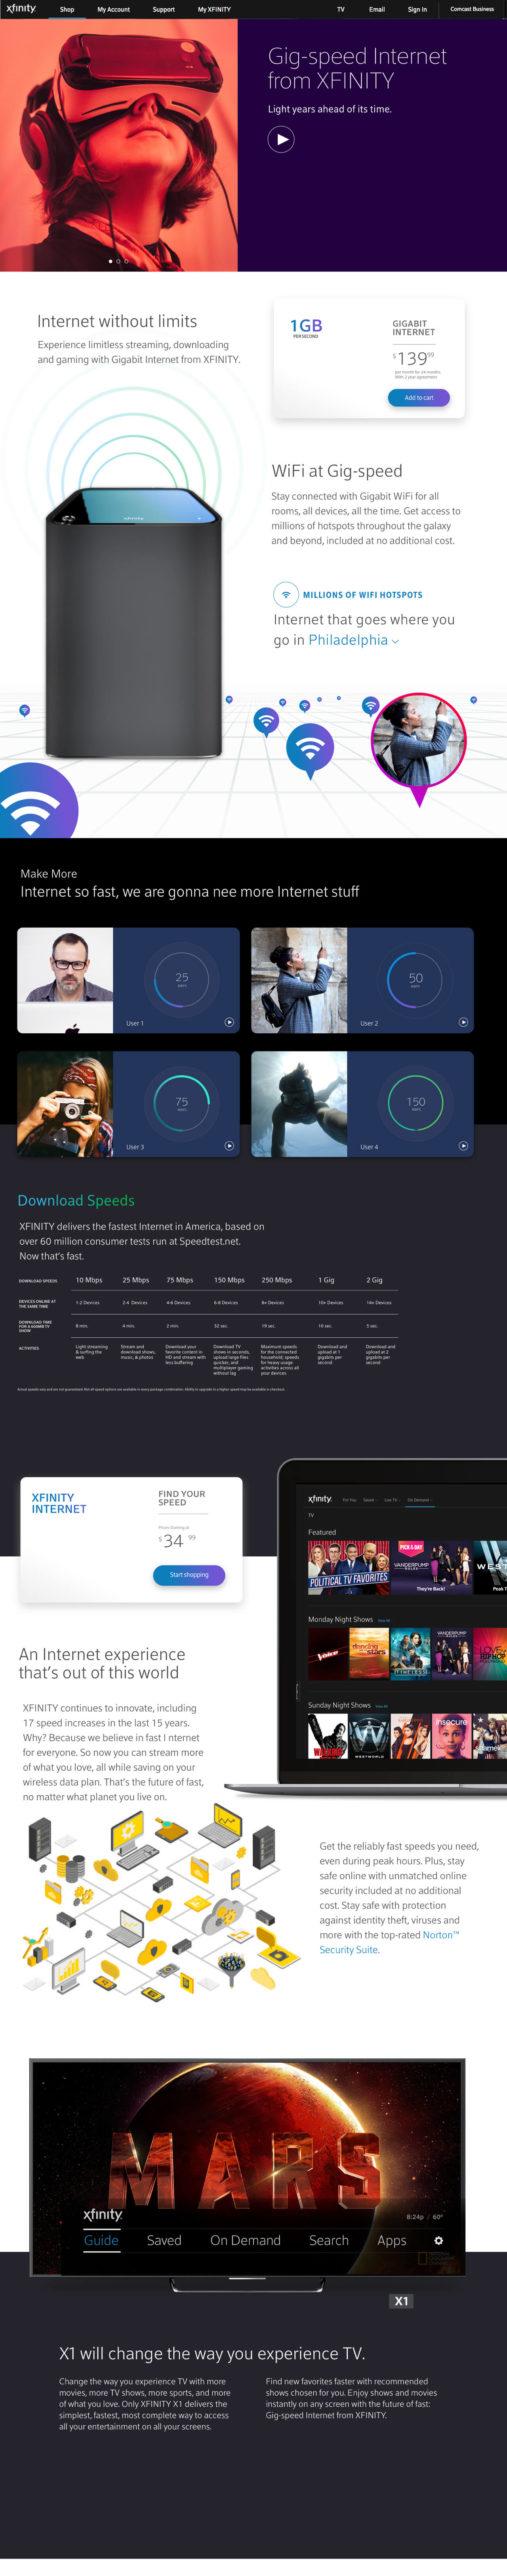 gig-virtual-reality-xfinity-comcast-concept-content-creators-2